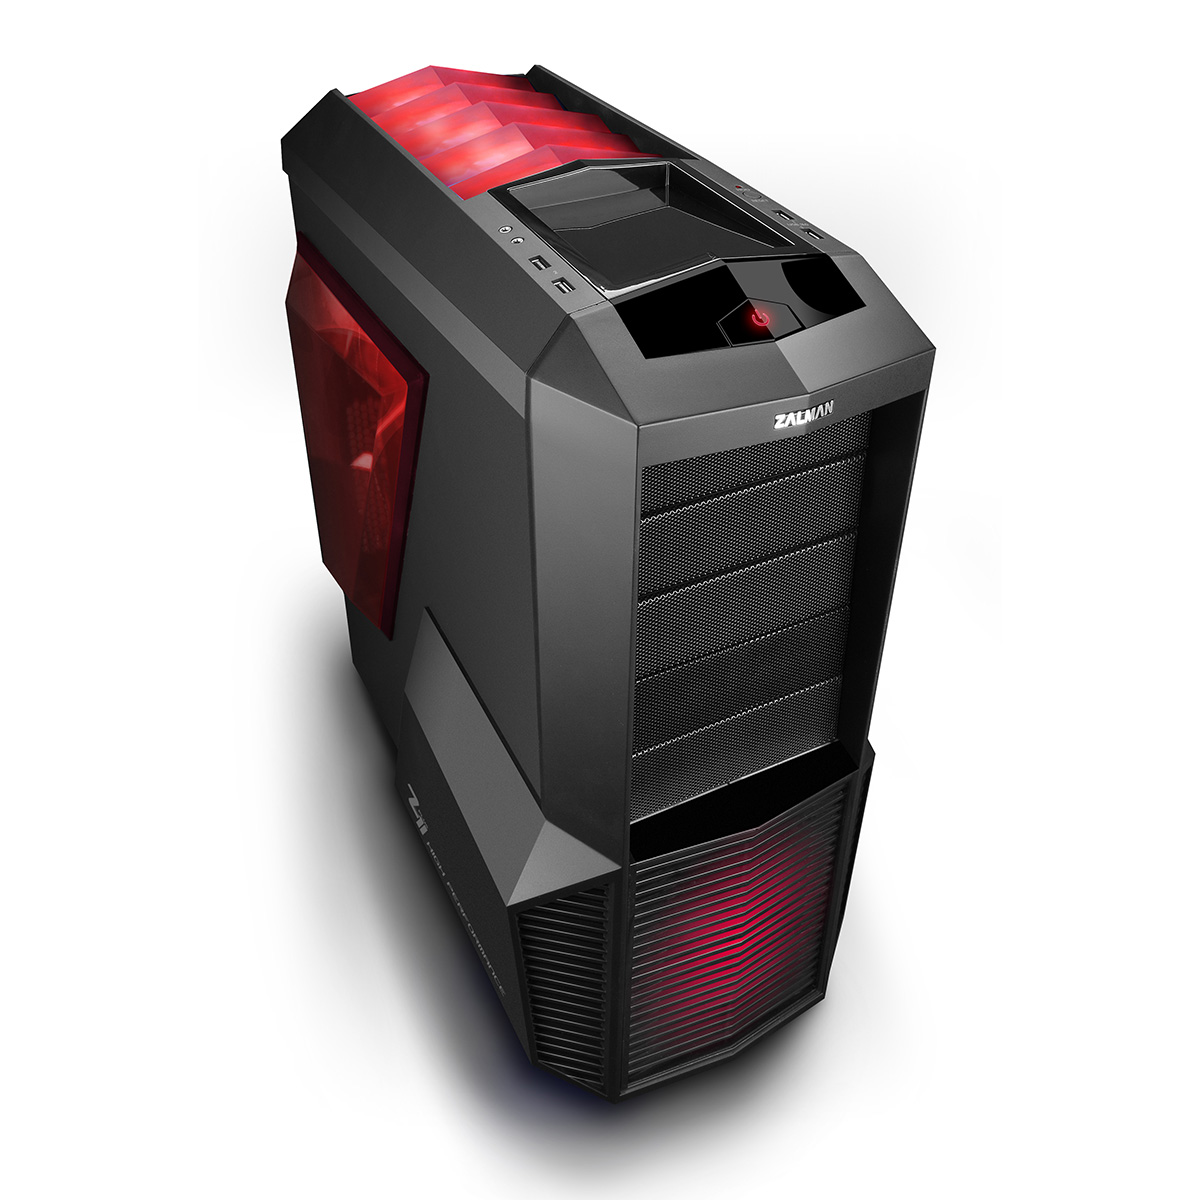 PC de bureau LDLC PC Origin AMD FX 4300 8 Go HDD 1 To AMD Radeon RX 470 4 Go Graveur DVD (sans OS - non monté)